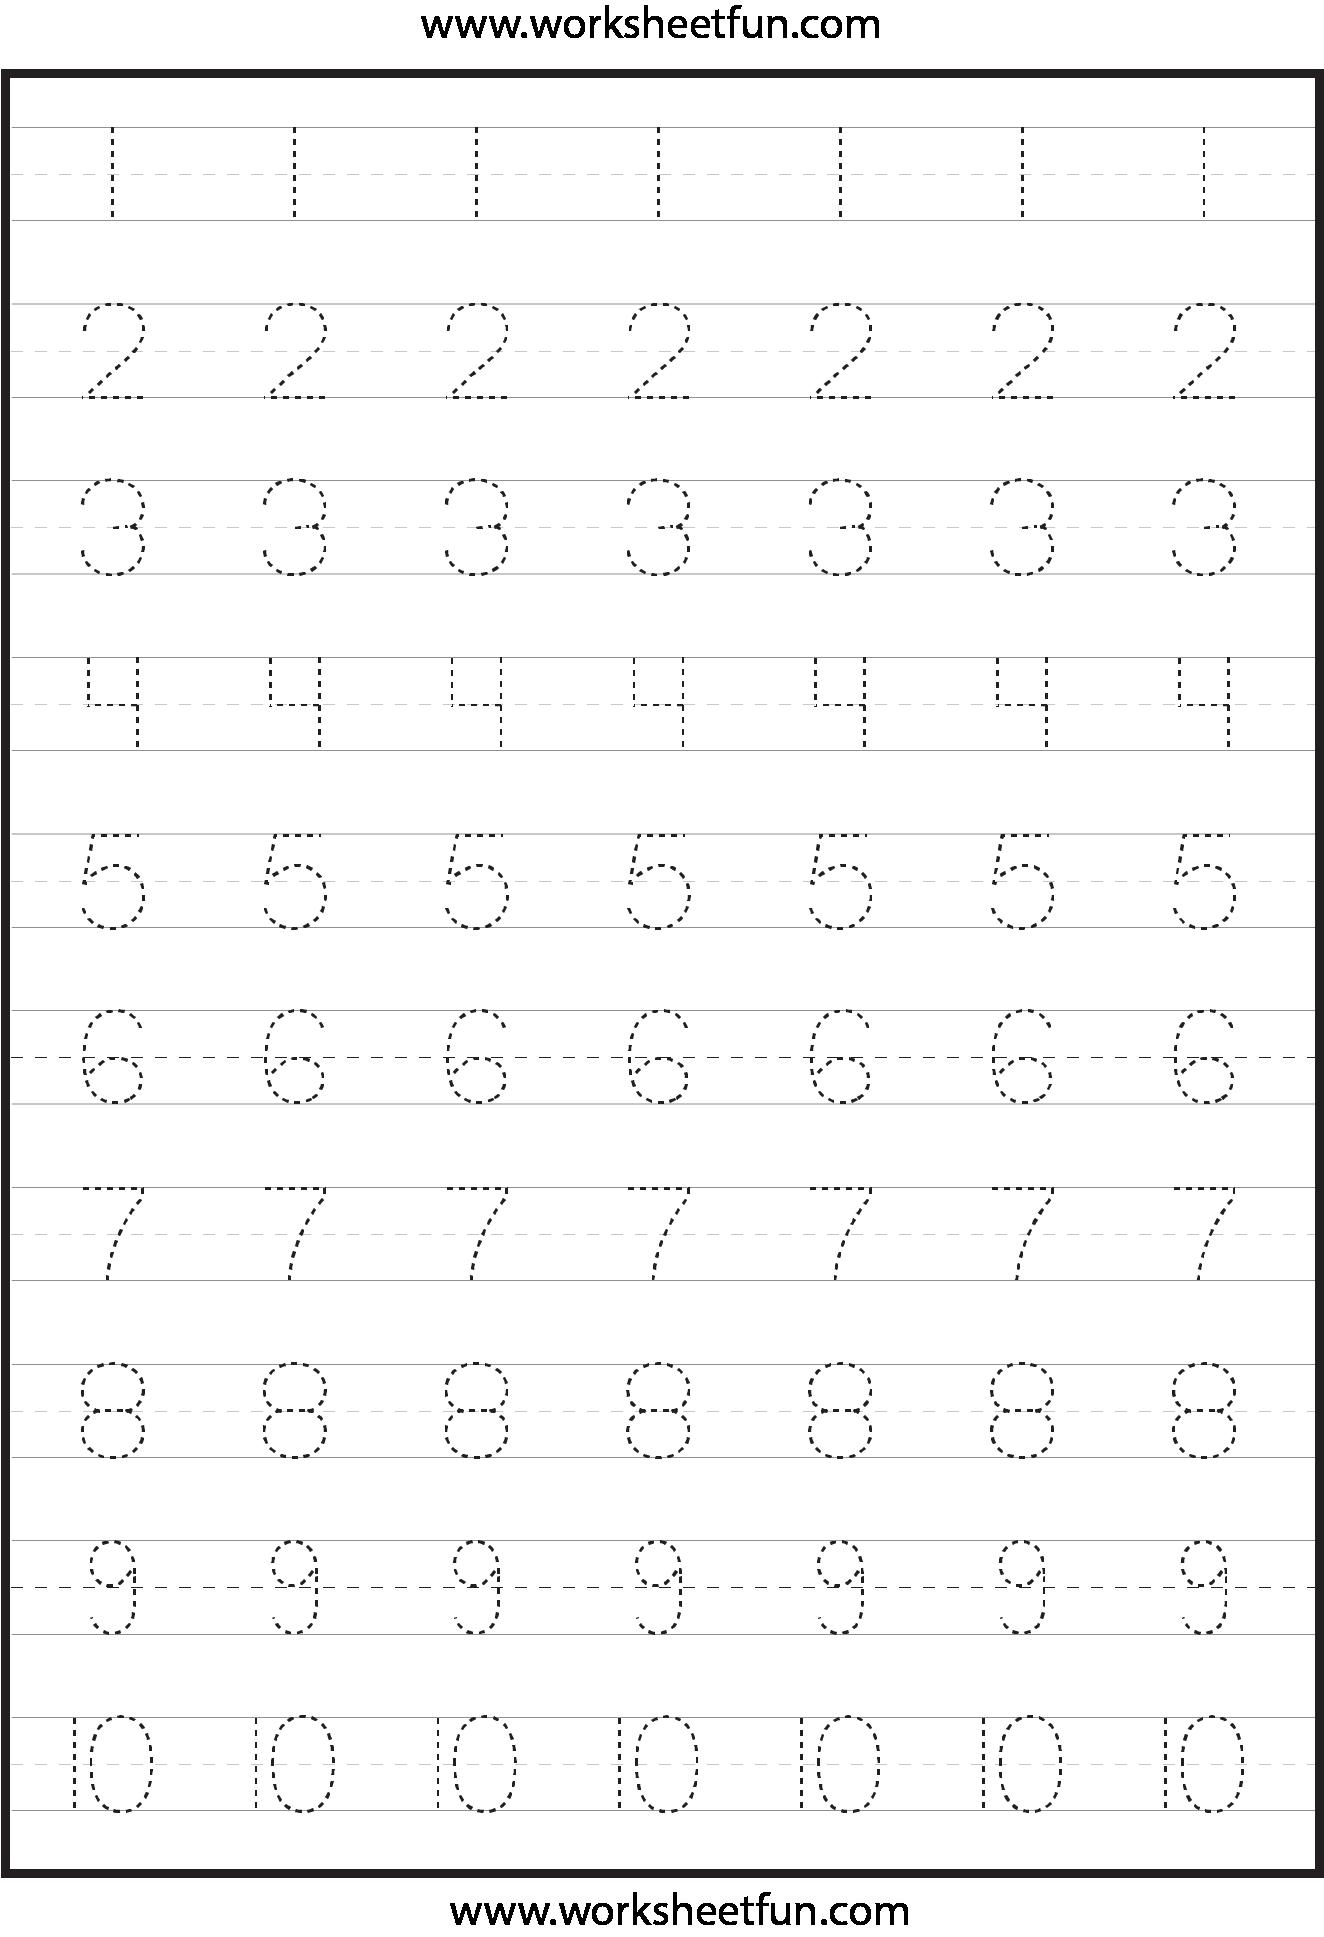 Tracing Numbers 1 10 Worksheets For Preschoolers - tracing numbers ...